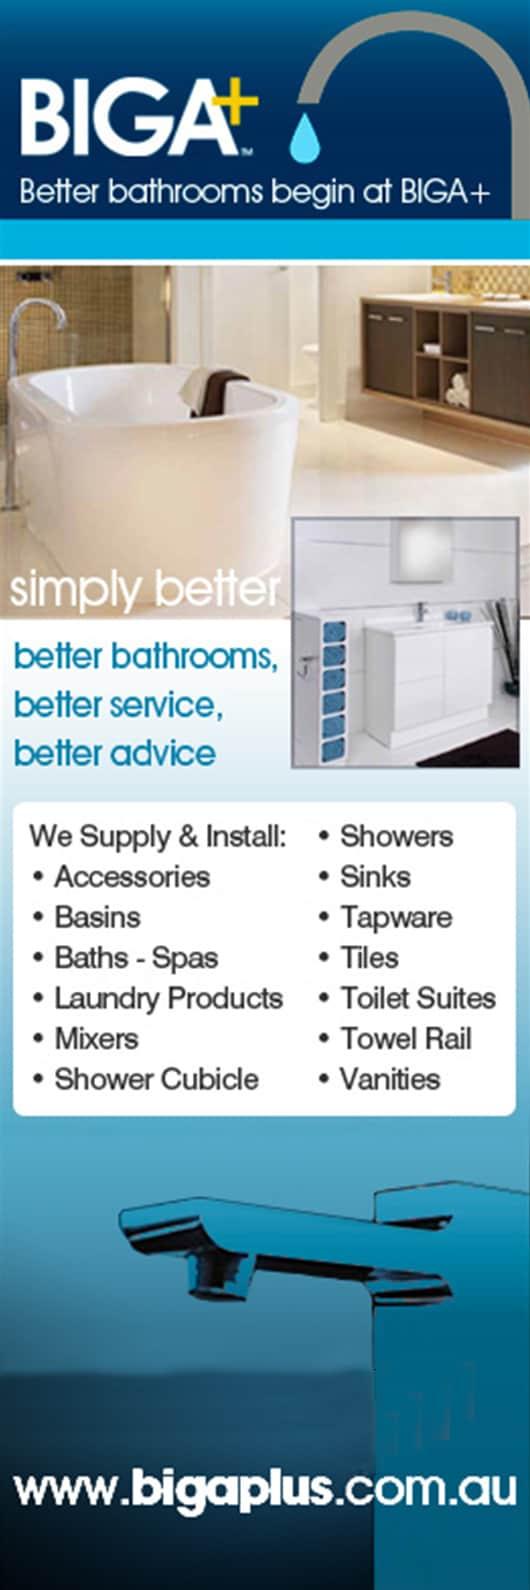 Bathroom Renovations Tweed Heads biga plus tweed heads south - bathroom accessories & equipment - 9